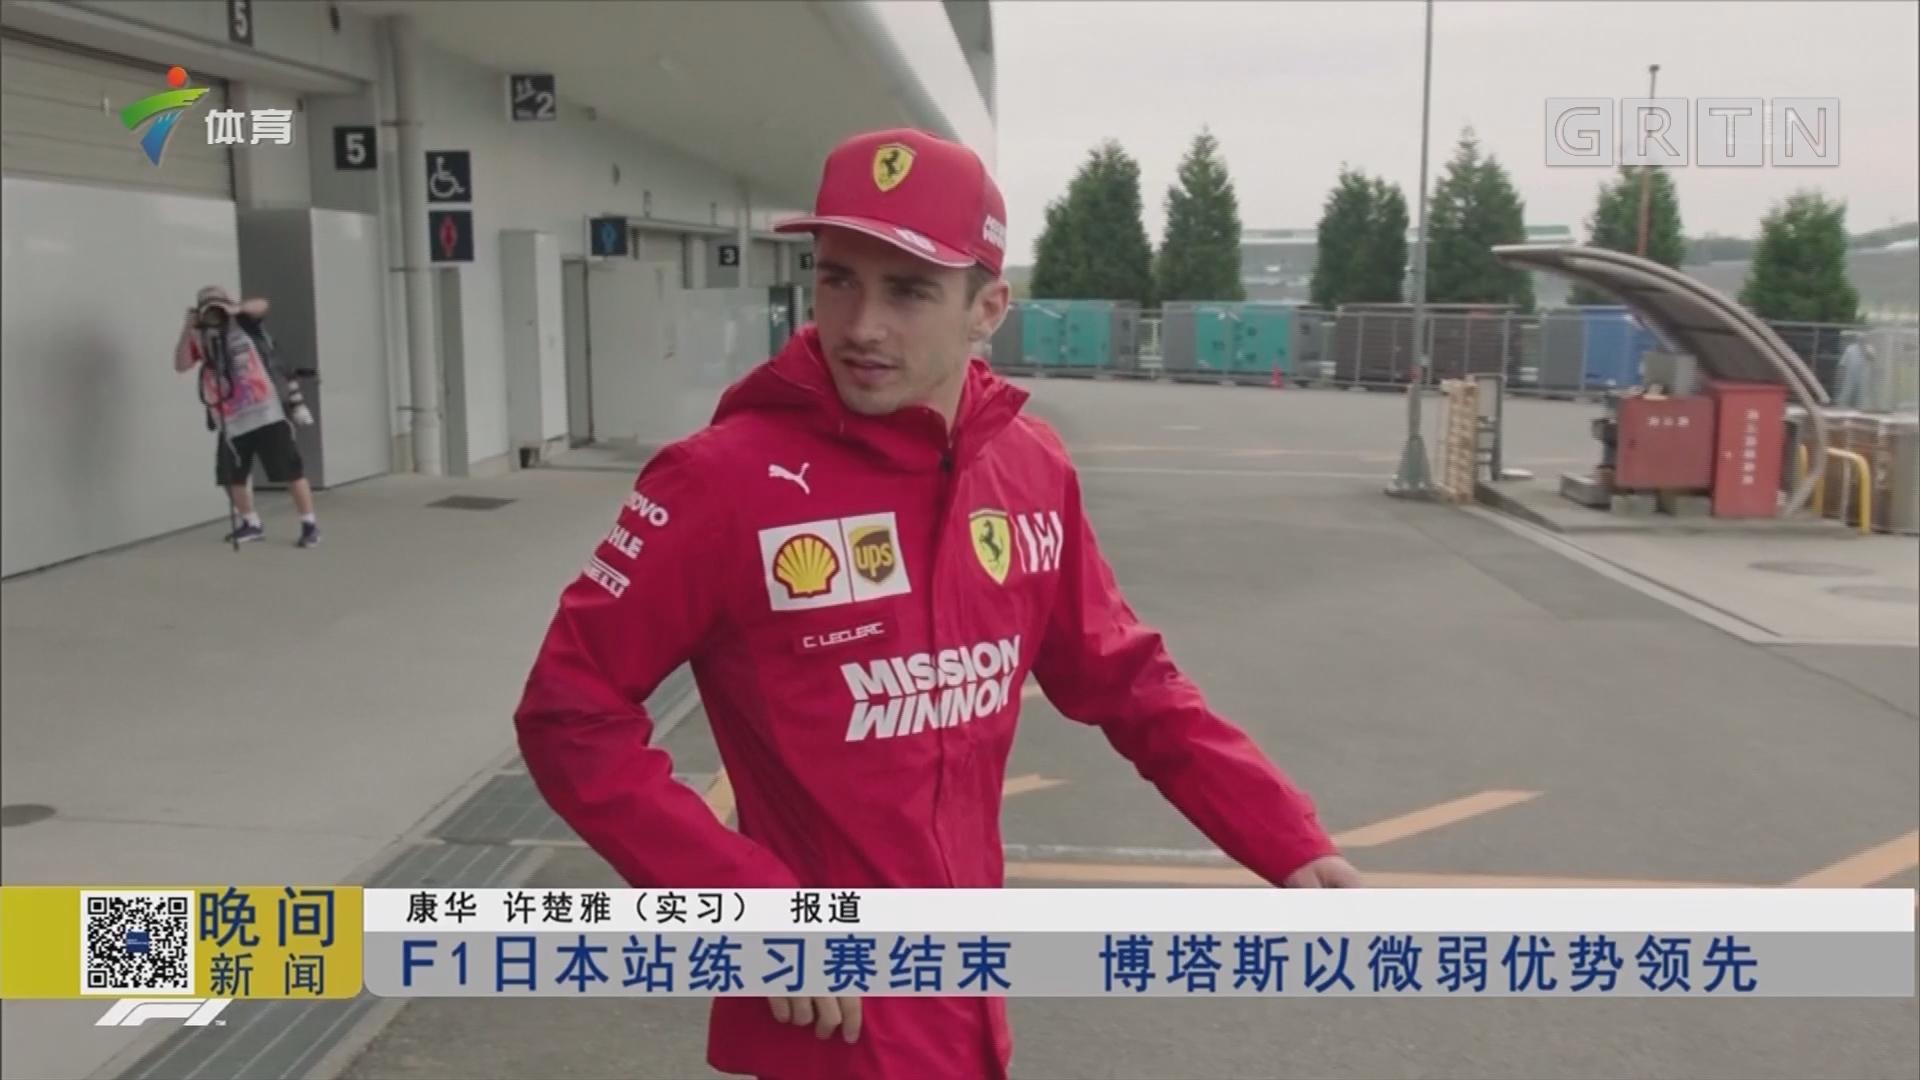 F1日本站练习赛结束 博塔斯以微弱优势领先